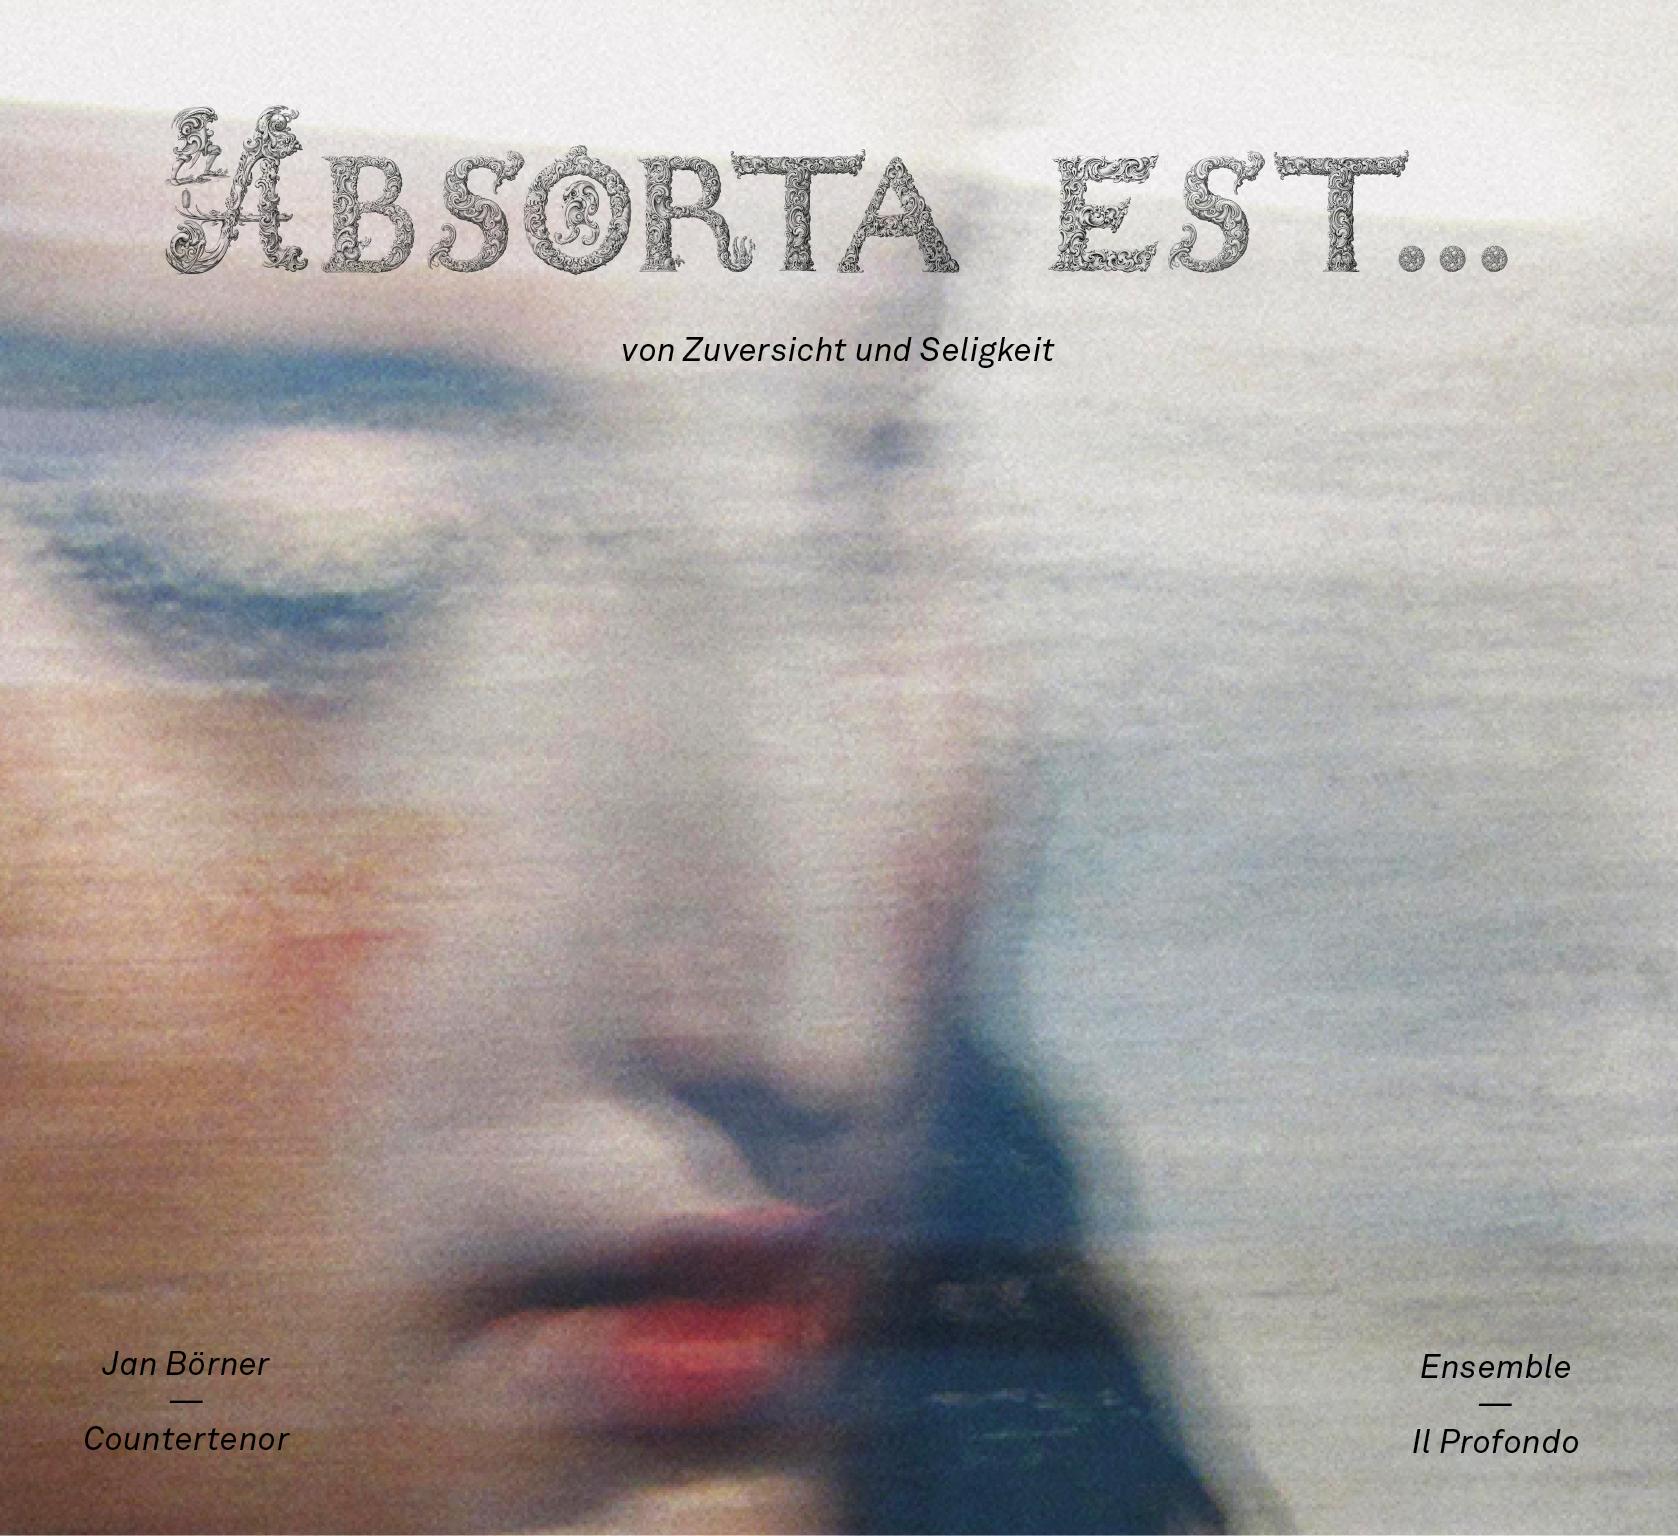 WEBSHOP-cover-absorta est-DEF-front.jpg